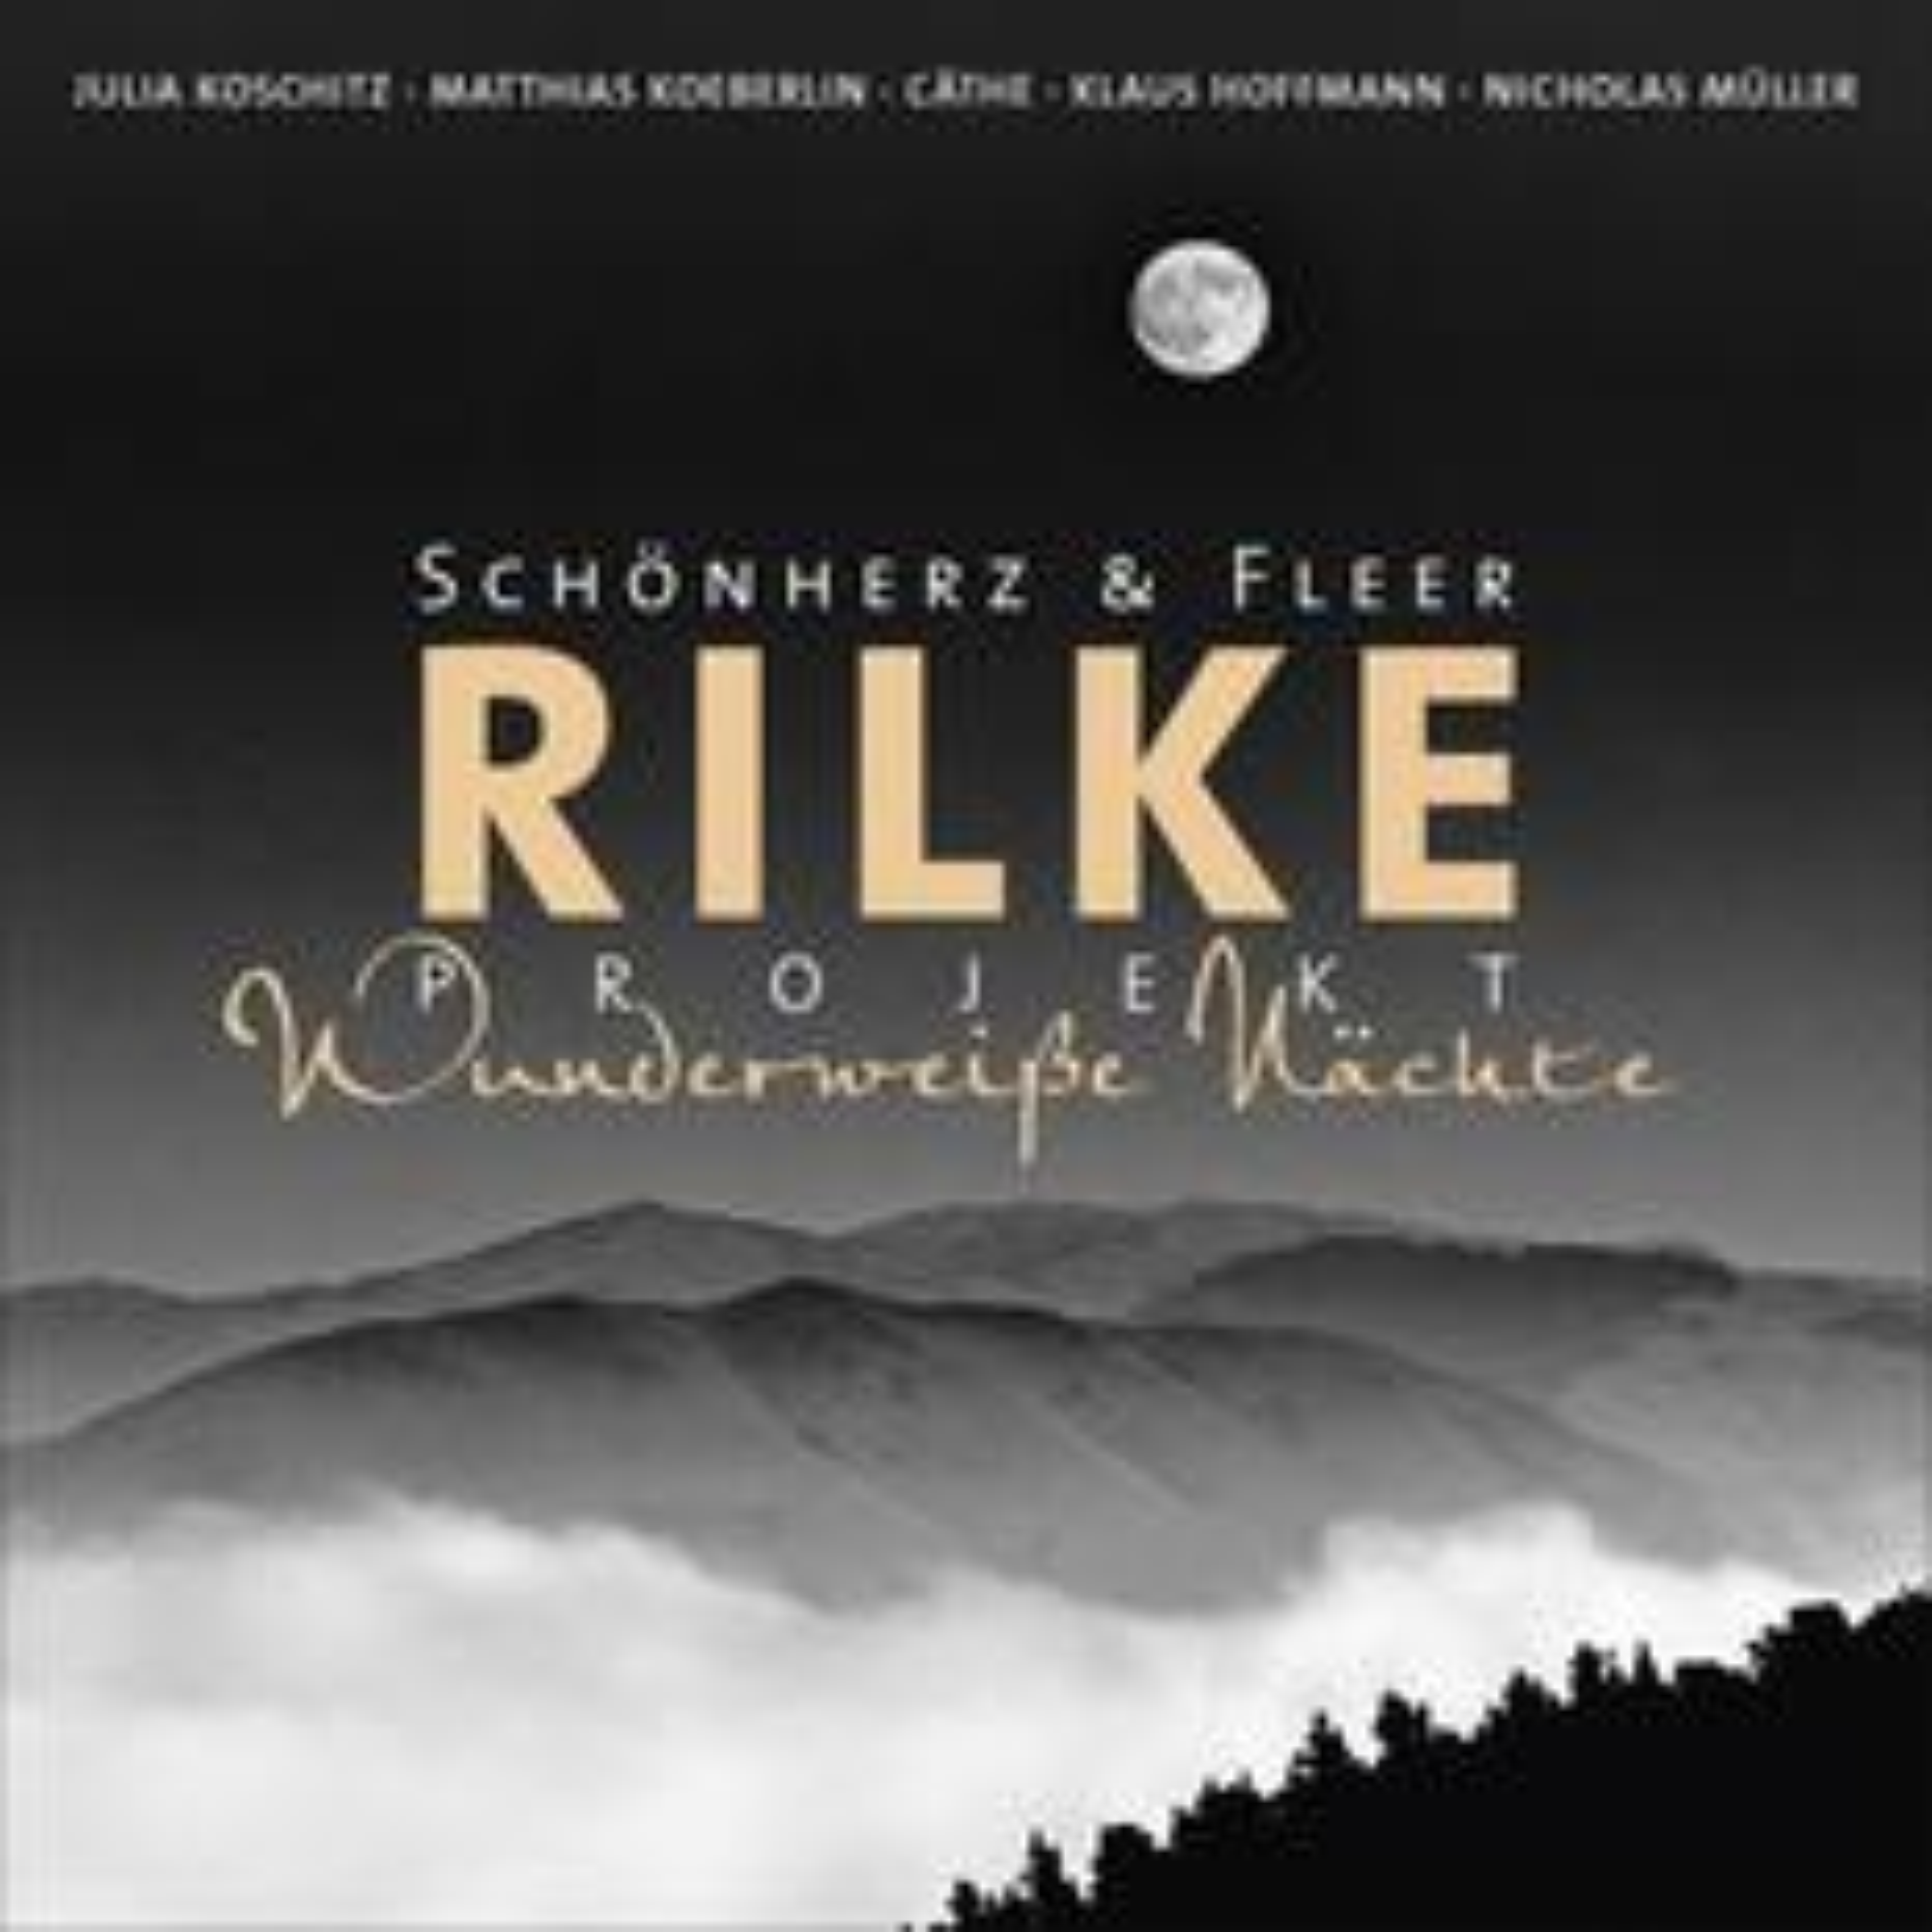 Rilke Projekt - Wunderweiße Nächte (1 Audio-CD)